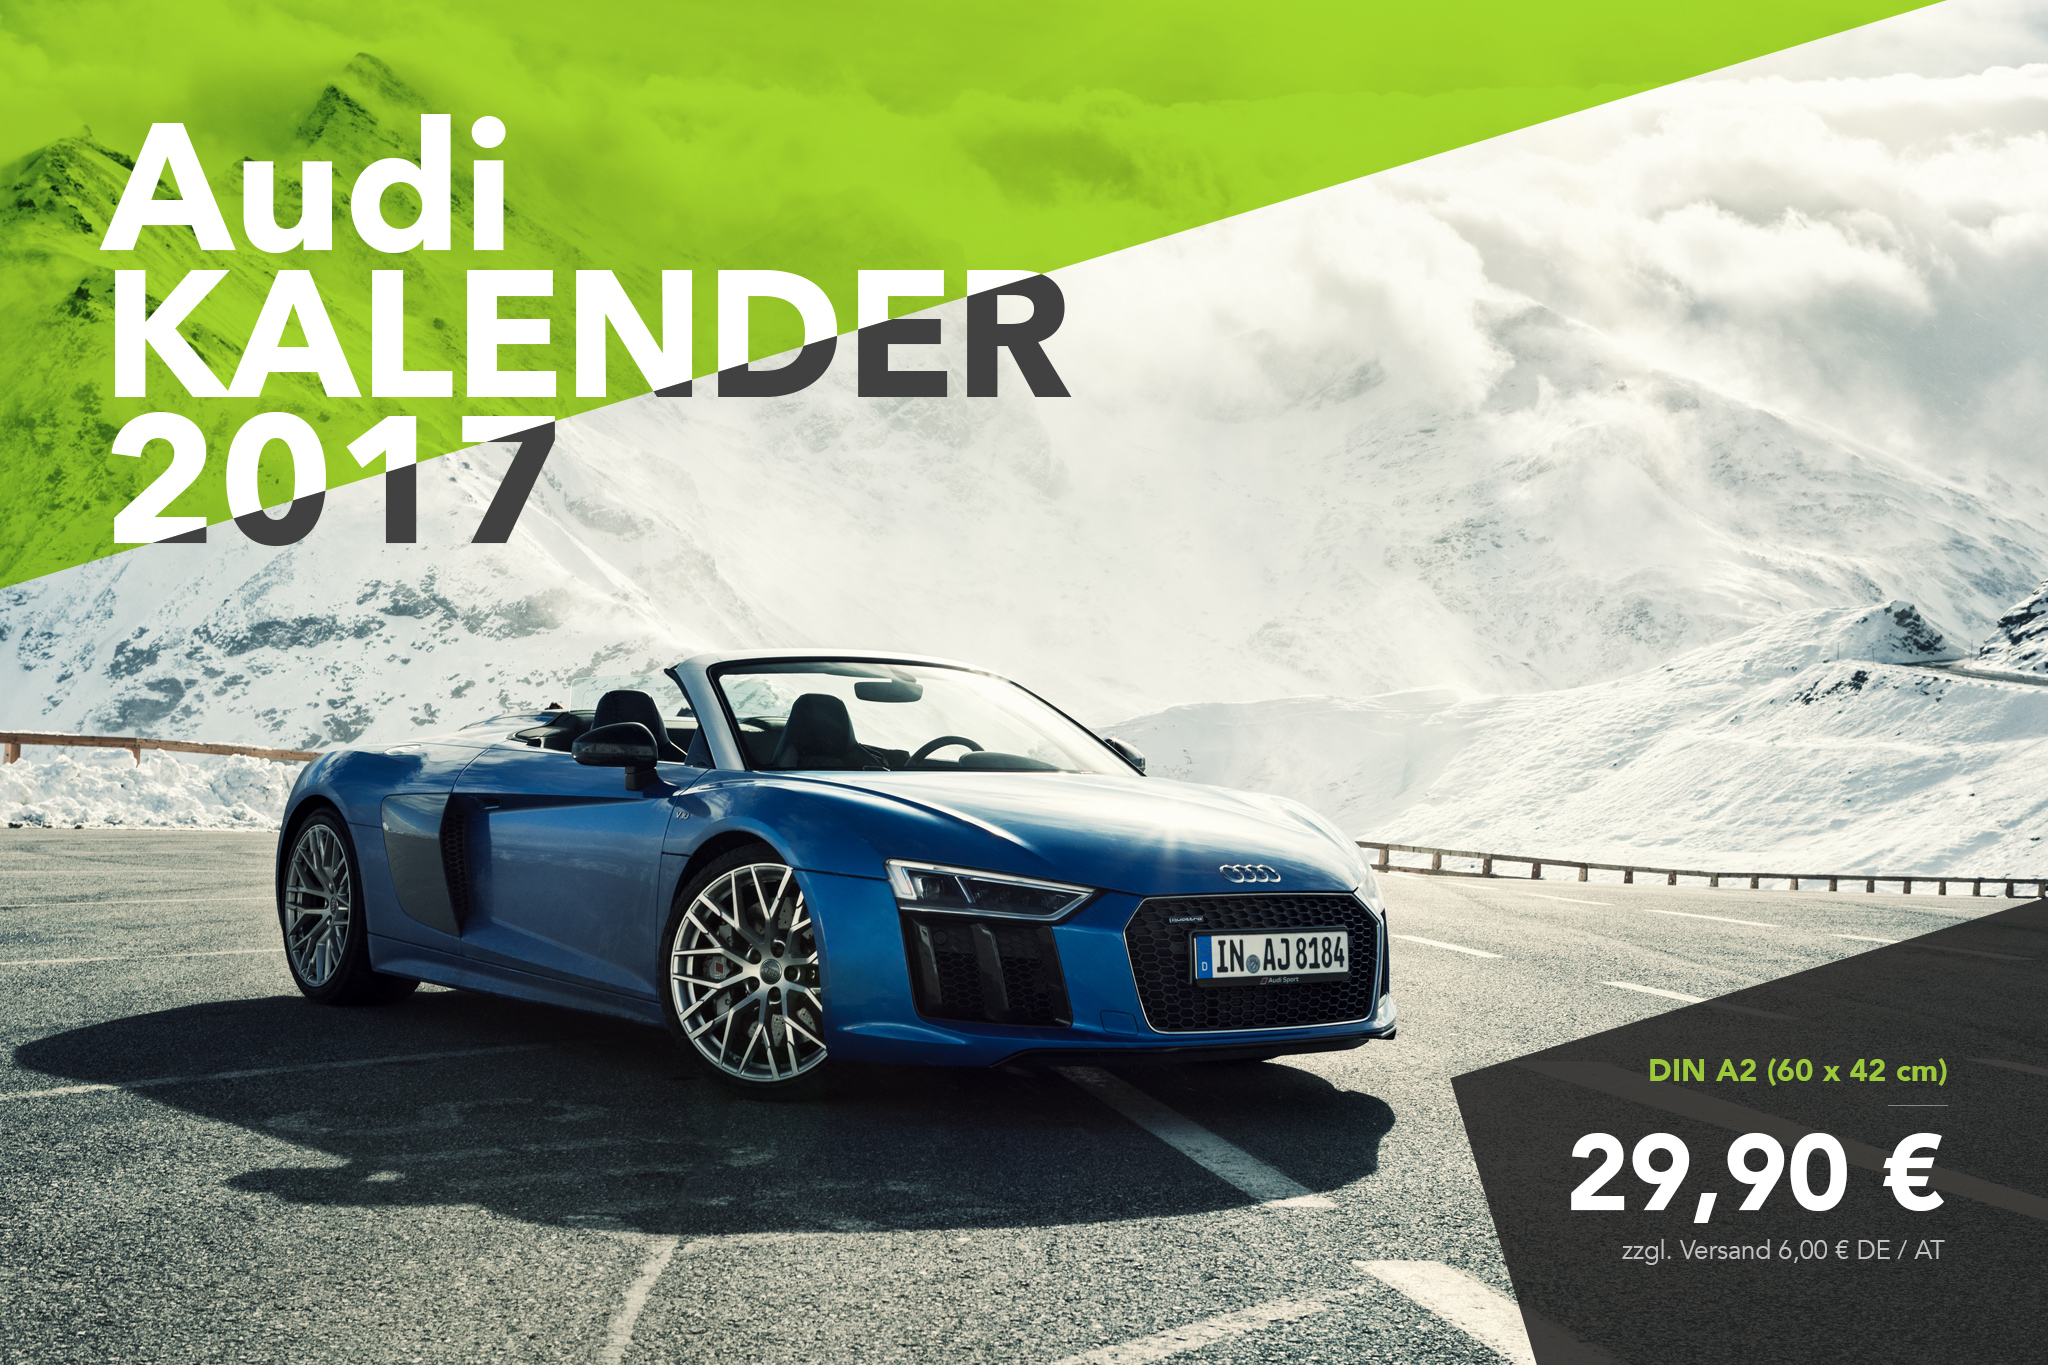 Audi Kalender 2017 - Simninja Special